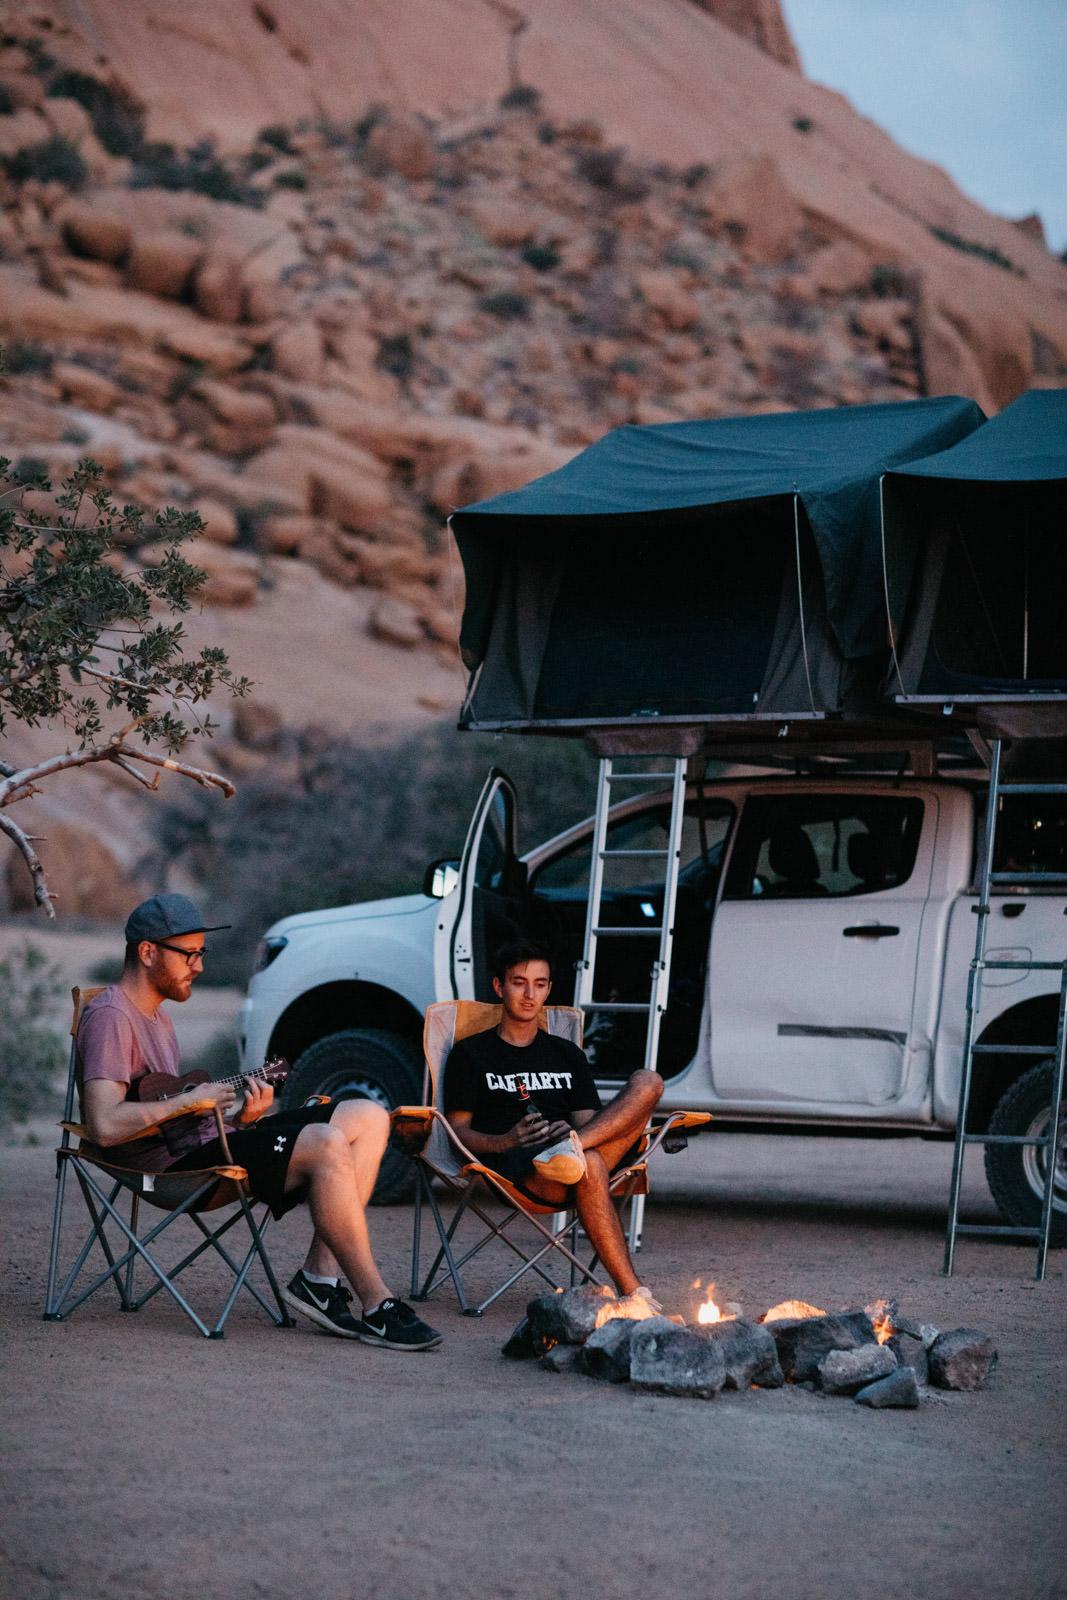 namibia_trip_rooftent_camping_roadtrip (17 von 18).jpg